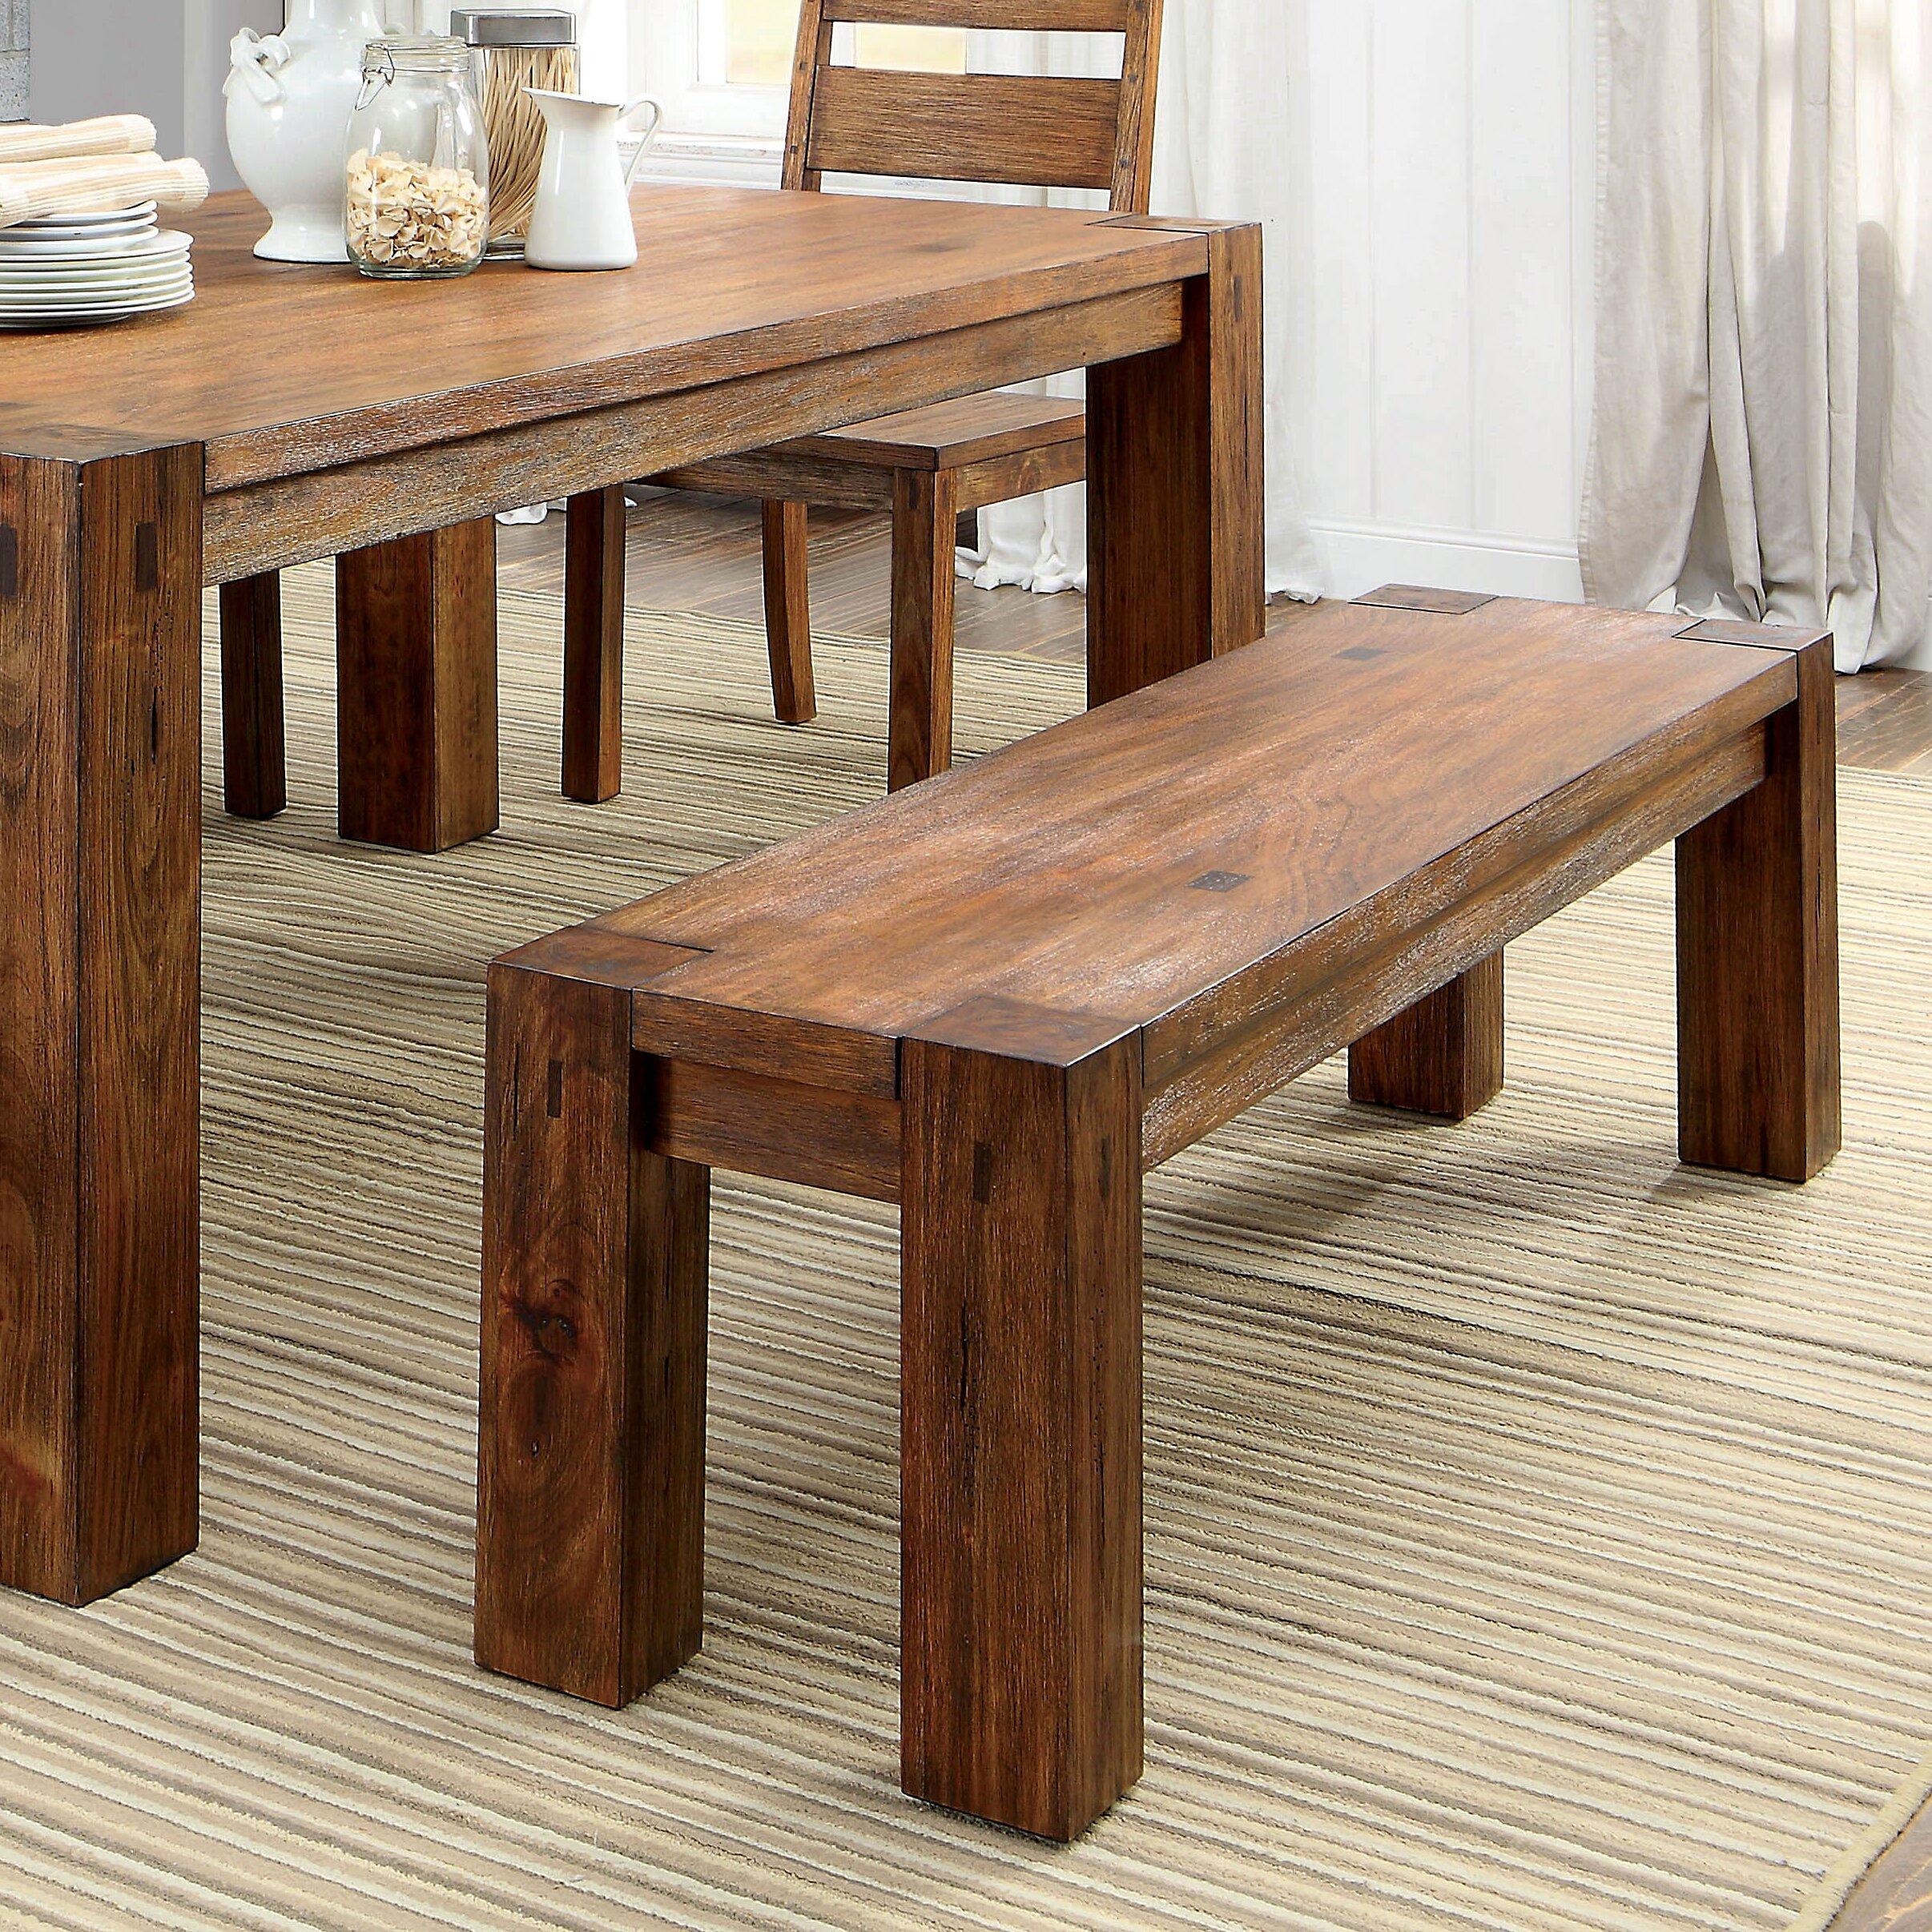 Hokku Designs Bethanne Wood Kitchen Bench & Reviews